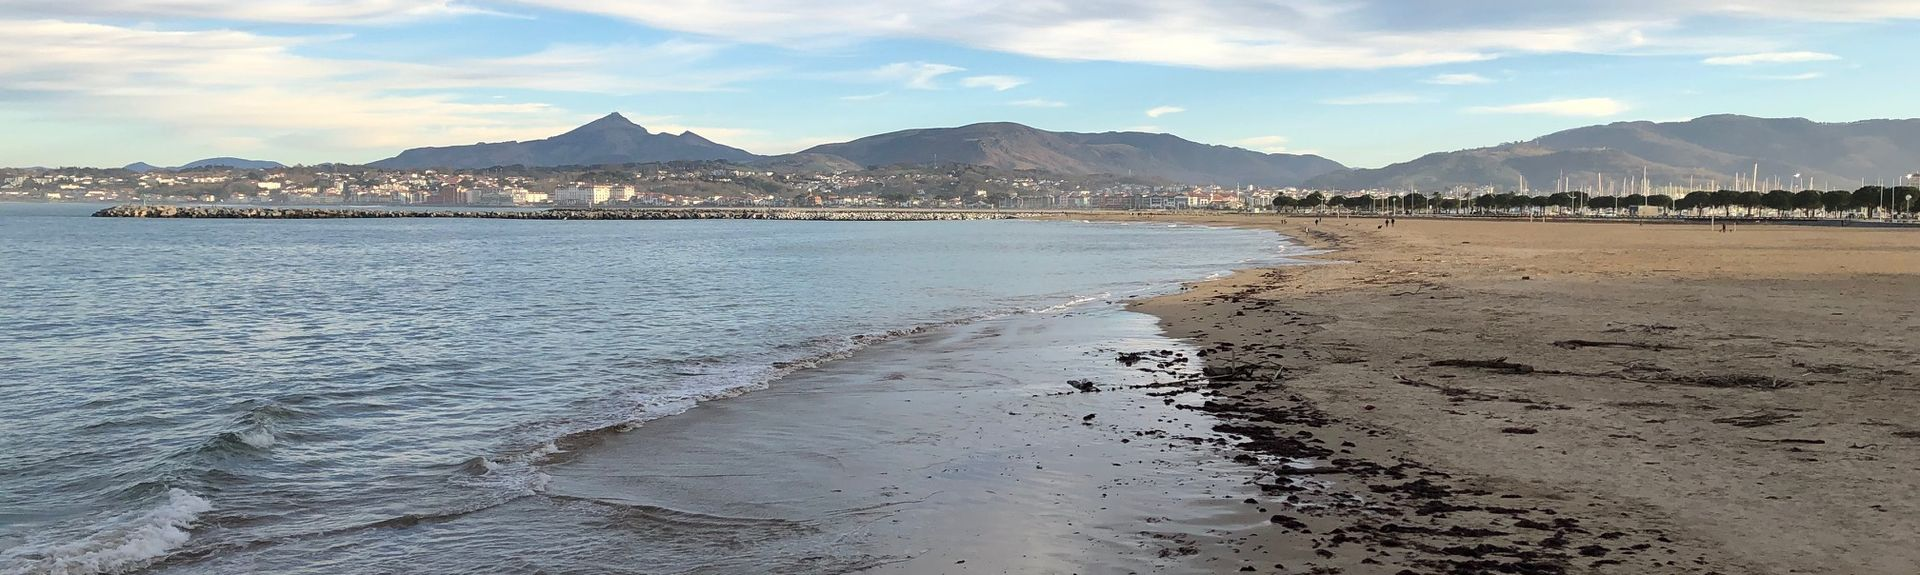 Etxalar, Navarre, Spanien